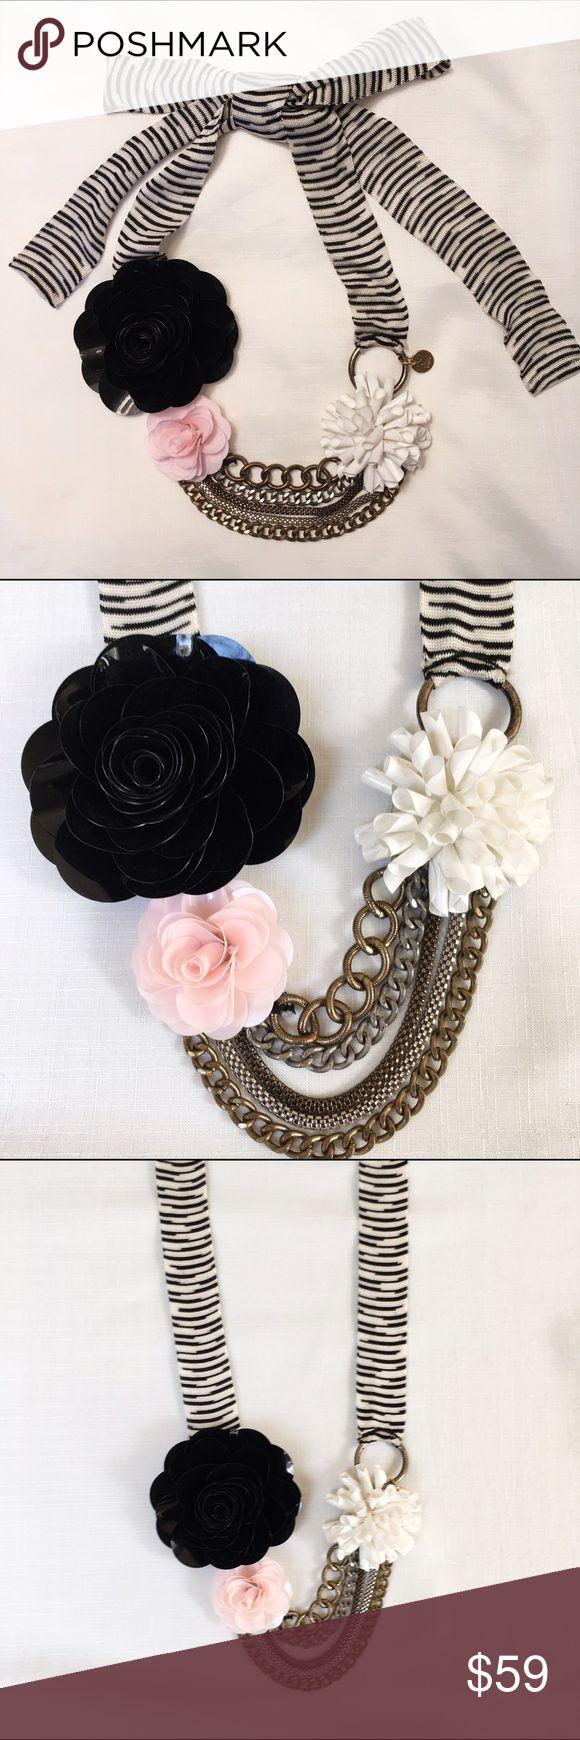 M Missoni crochet necklace. Like new M Missoni crochet and flower necklace. M by Missoni Jewelry Necklaces